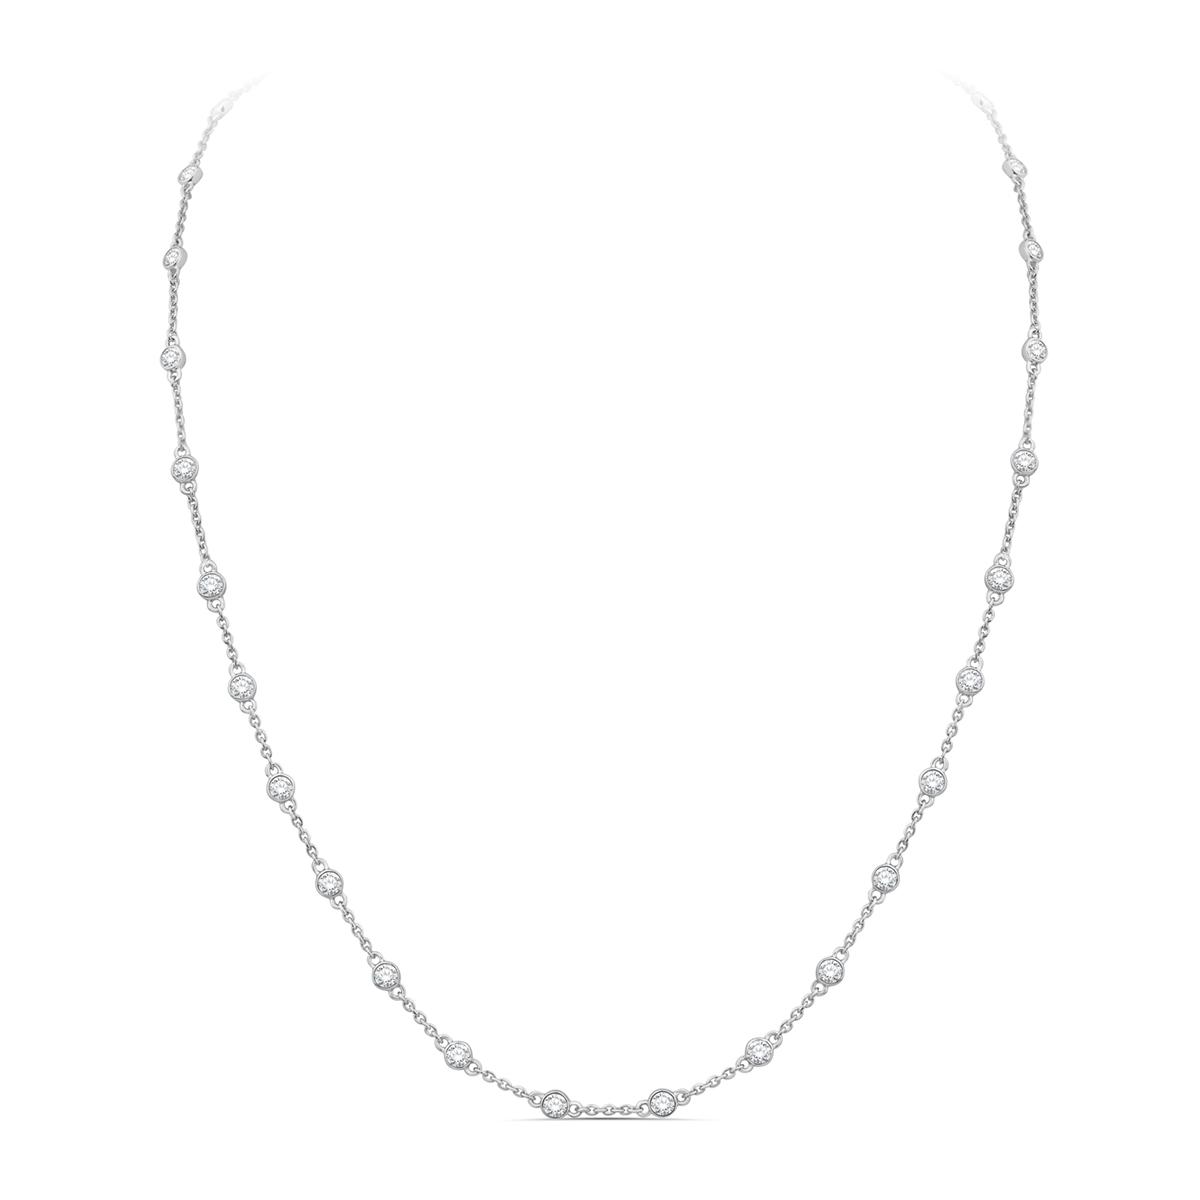 Paramount Gems 14 Karat White Gold 3 Carat Diamond By the Yard Necklace